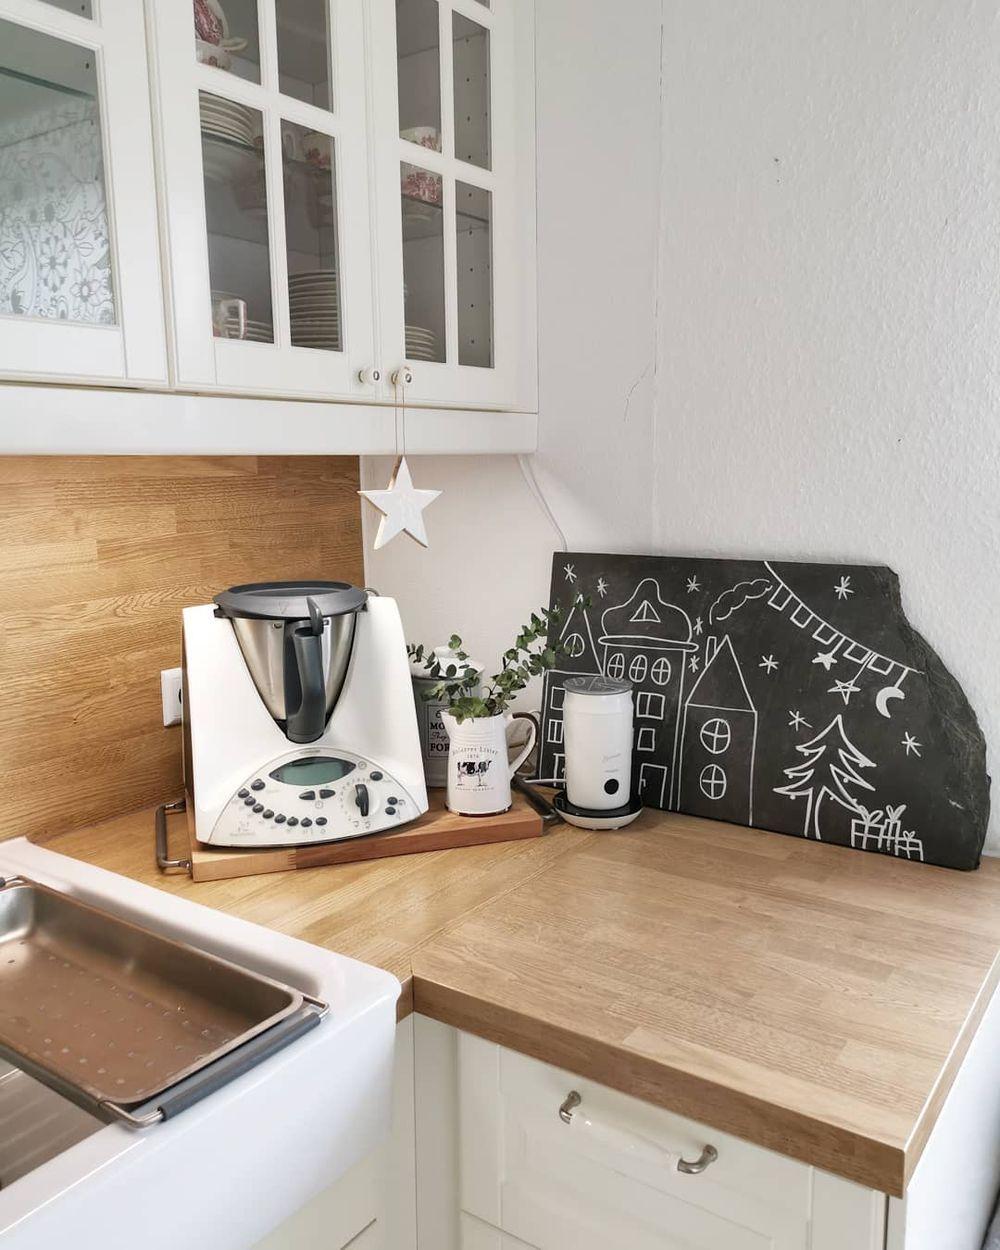 Simple Scandi Christmas Kitchen corner decor via @_______m_arina